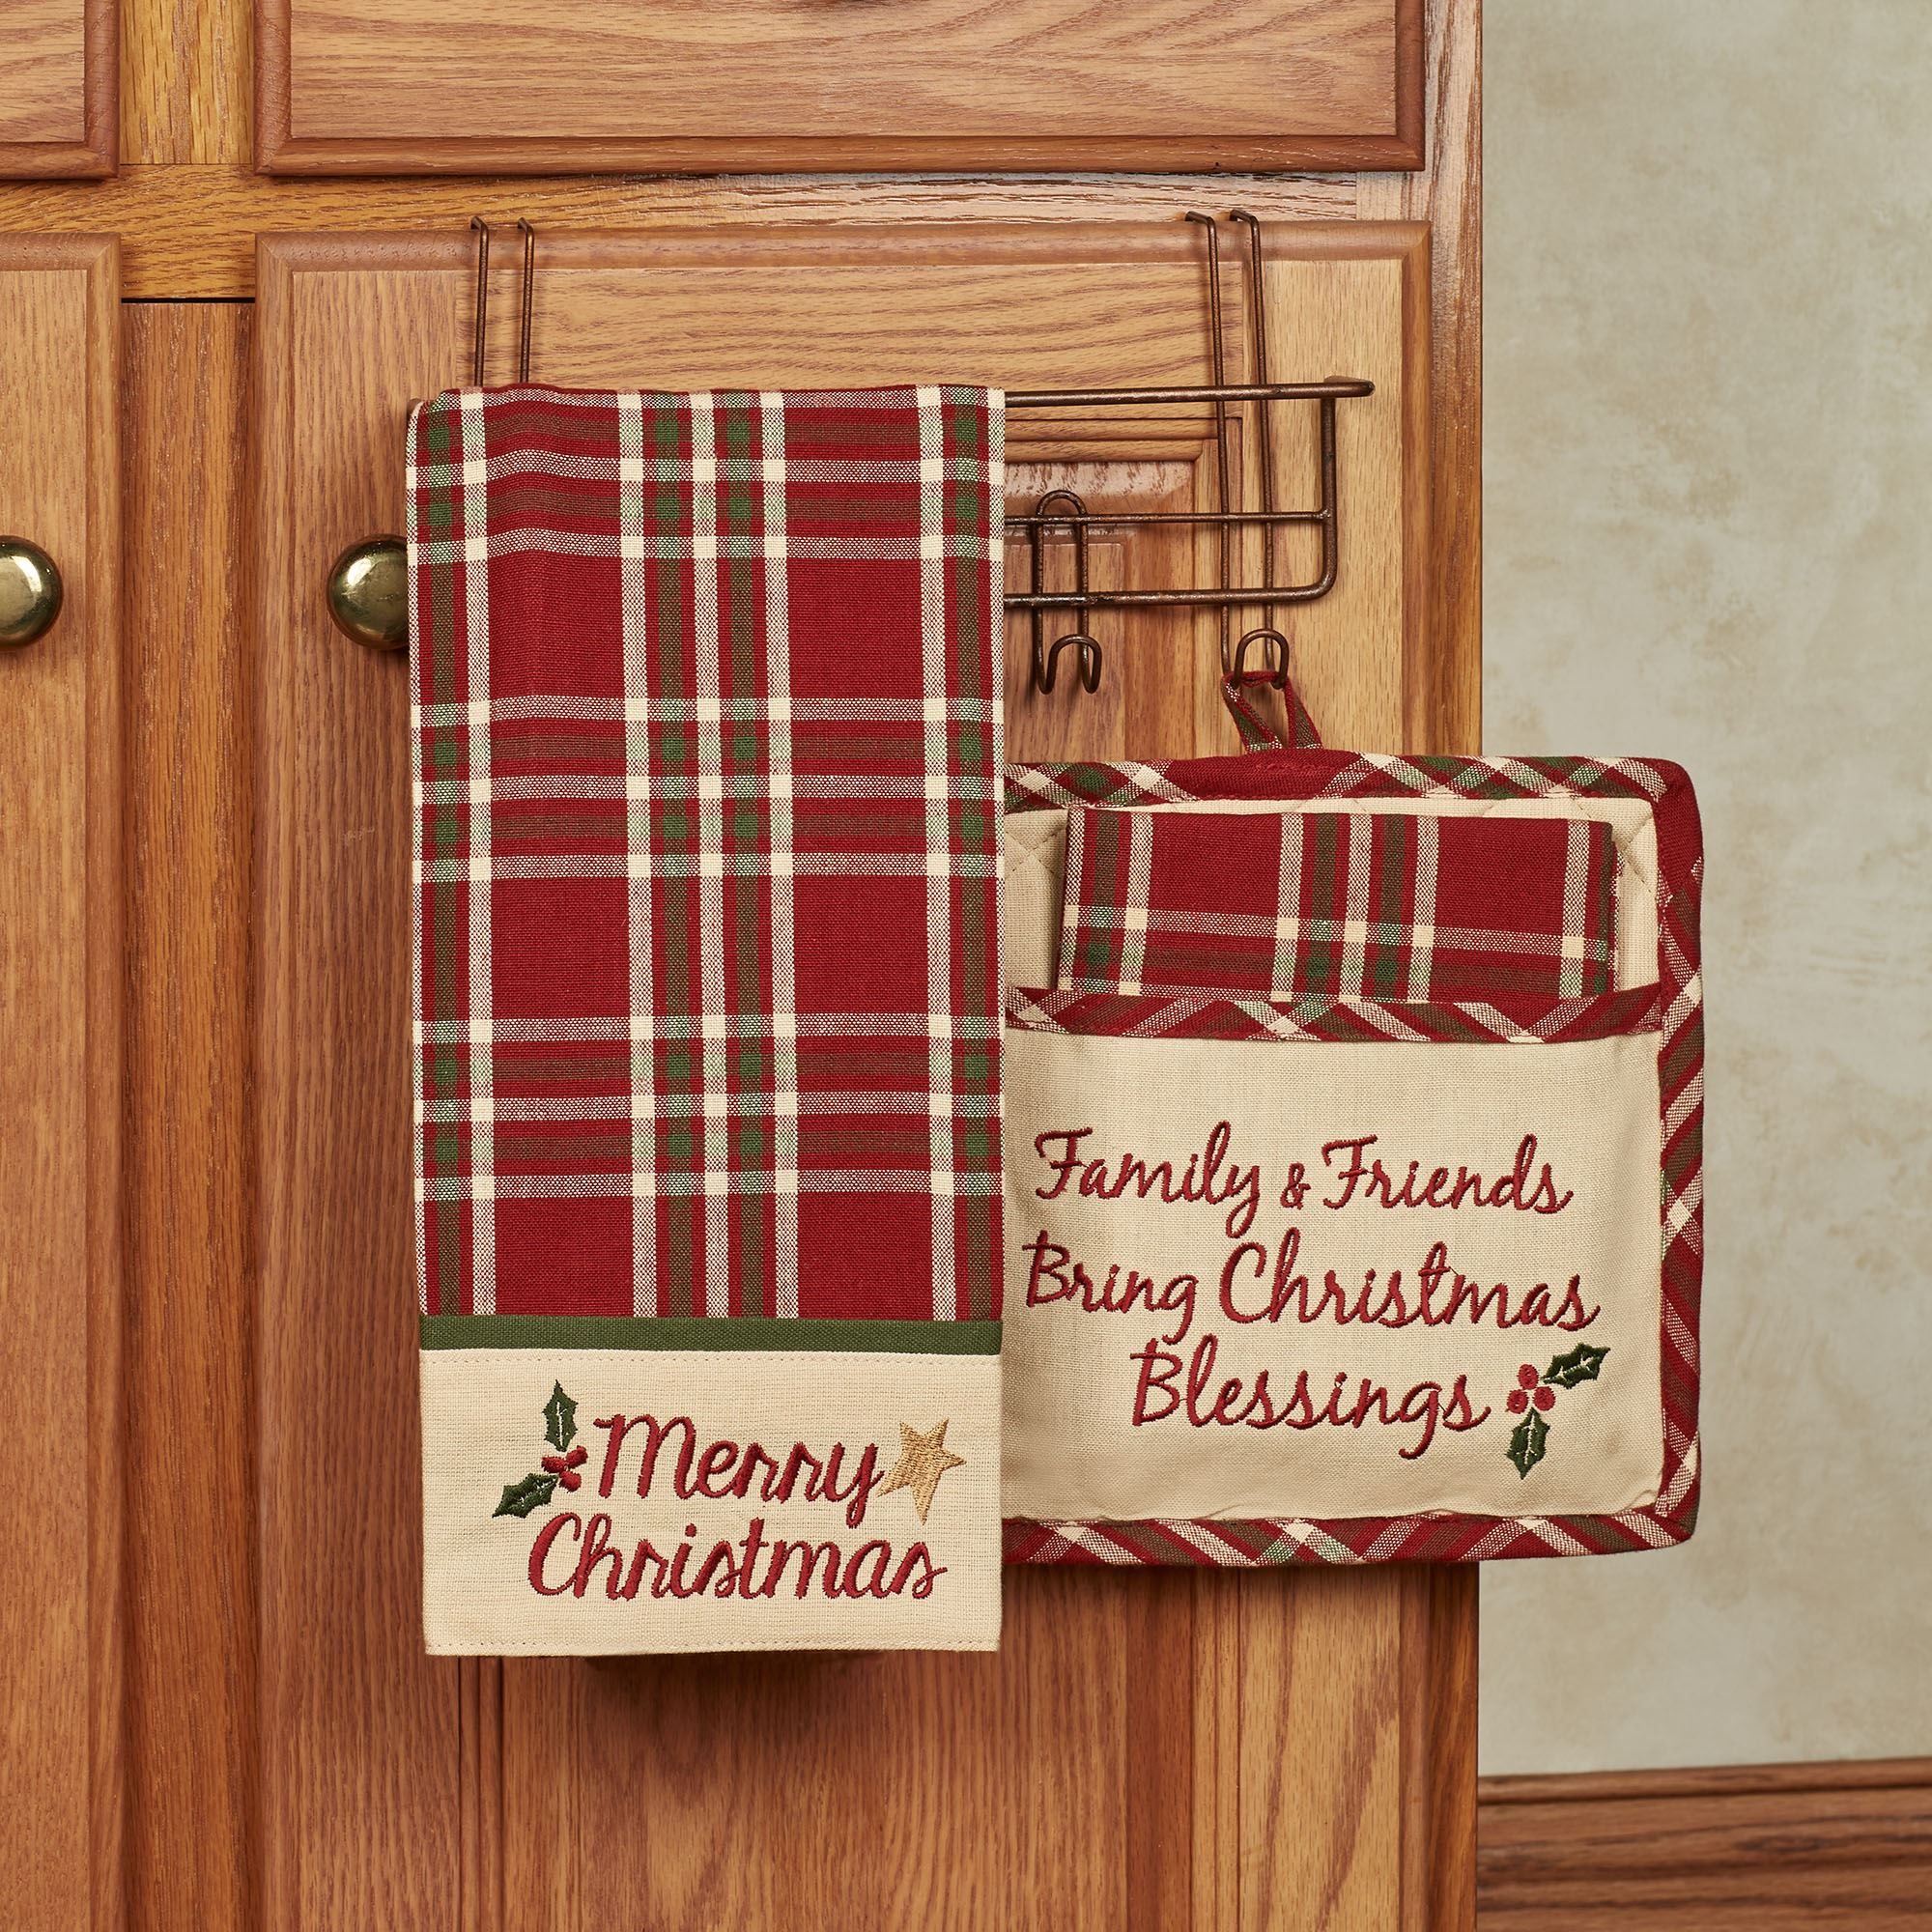 Merry Christmas 3 pc Kitchen Linen Set